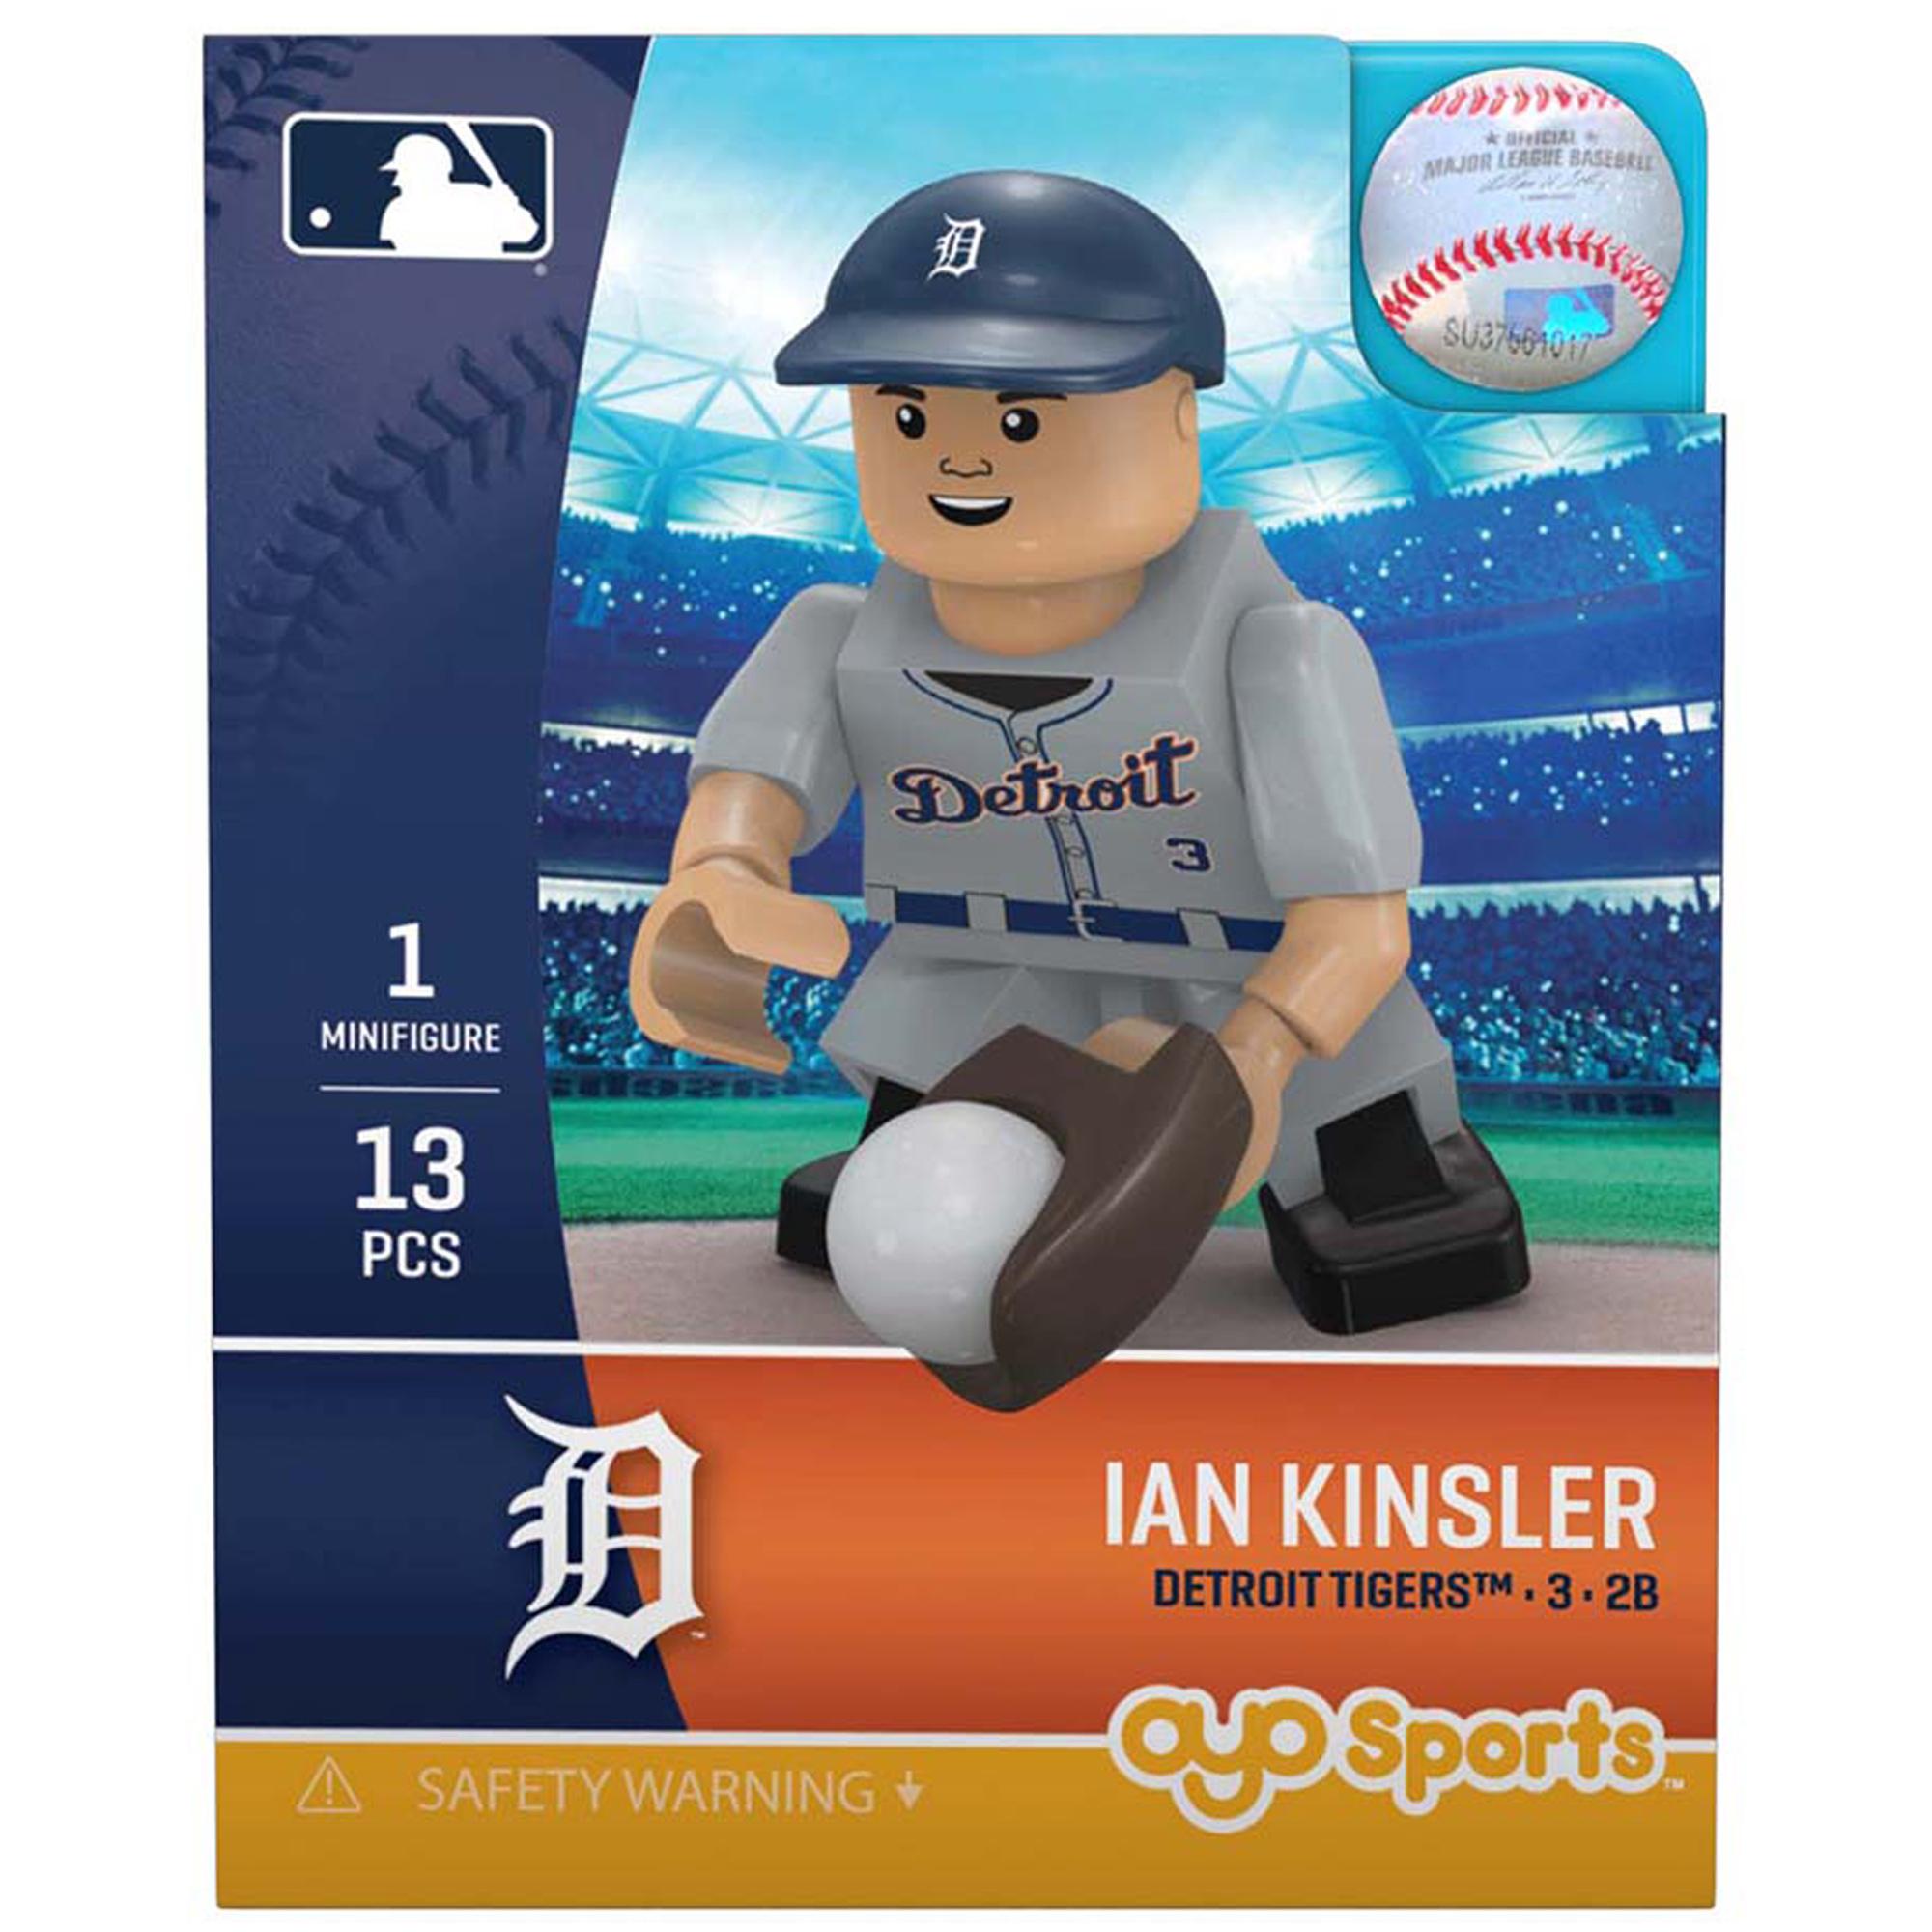 Ian Kinsler Detroit Tigers OYO Sports Generation 5 Mini Figurine - No Size